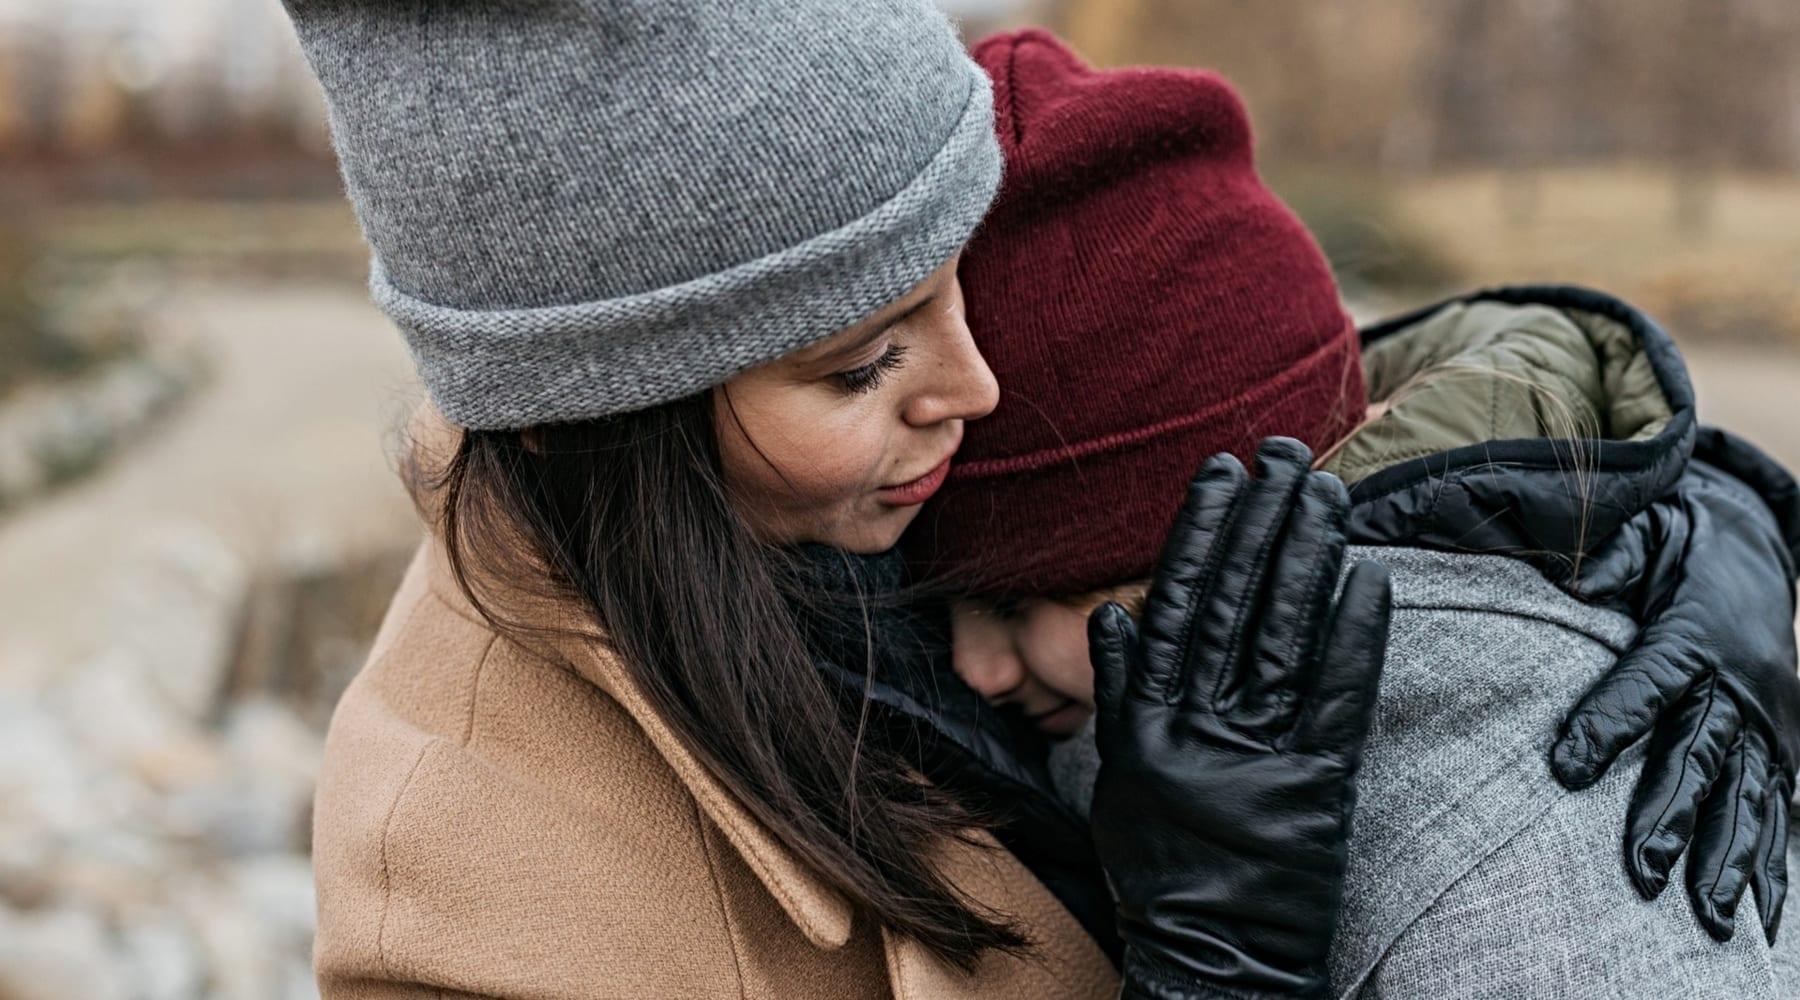 Whom Do U.S. Christian Teens Seek for Encouragement, Advice?